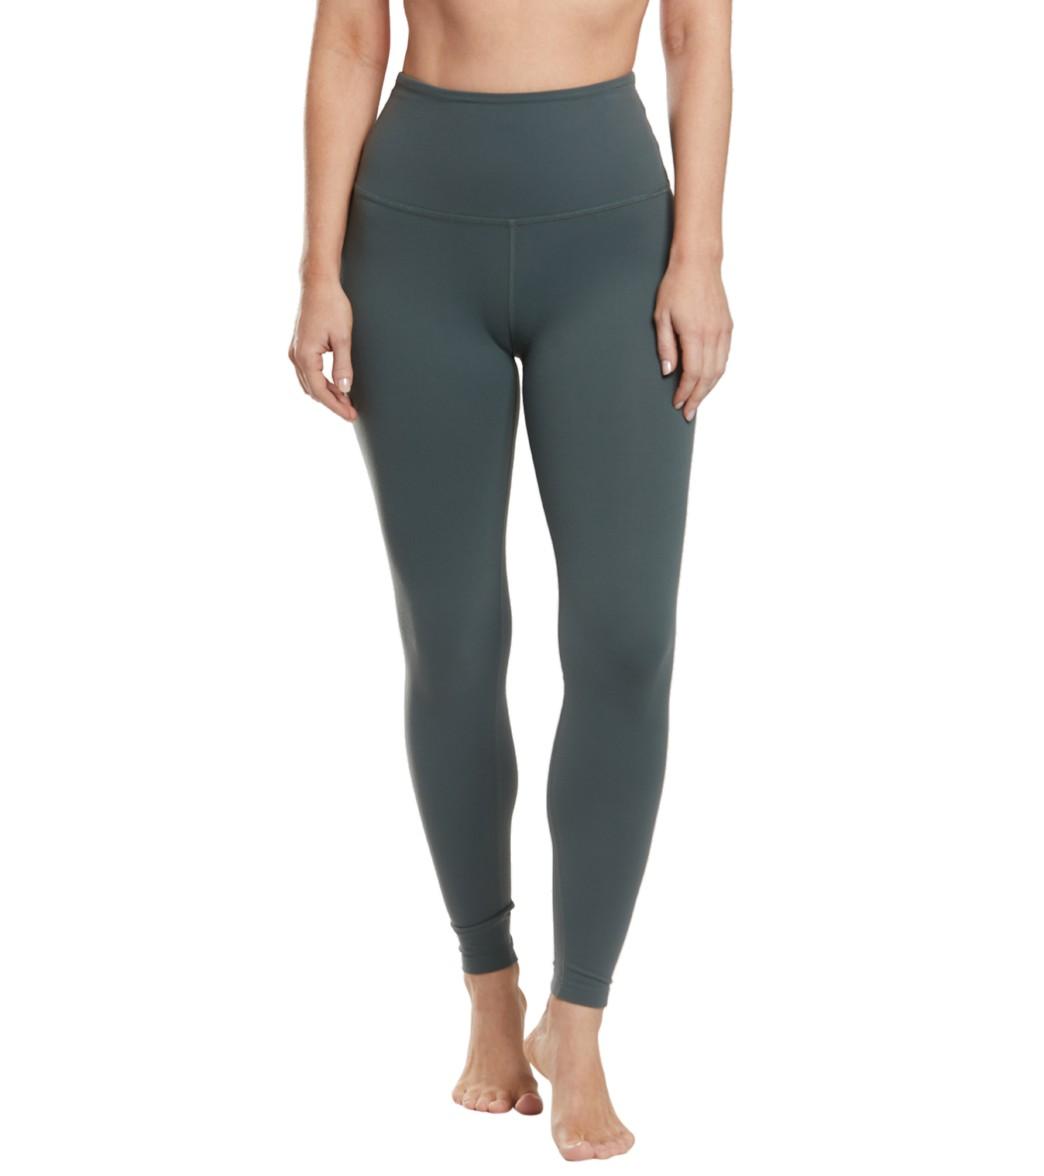 a18e0ca5b75d1 Beyond Yoga High Waisted 7/8 Yoga Leggings at YogaOutlet.com - Free ...